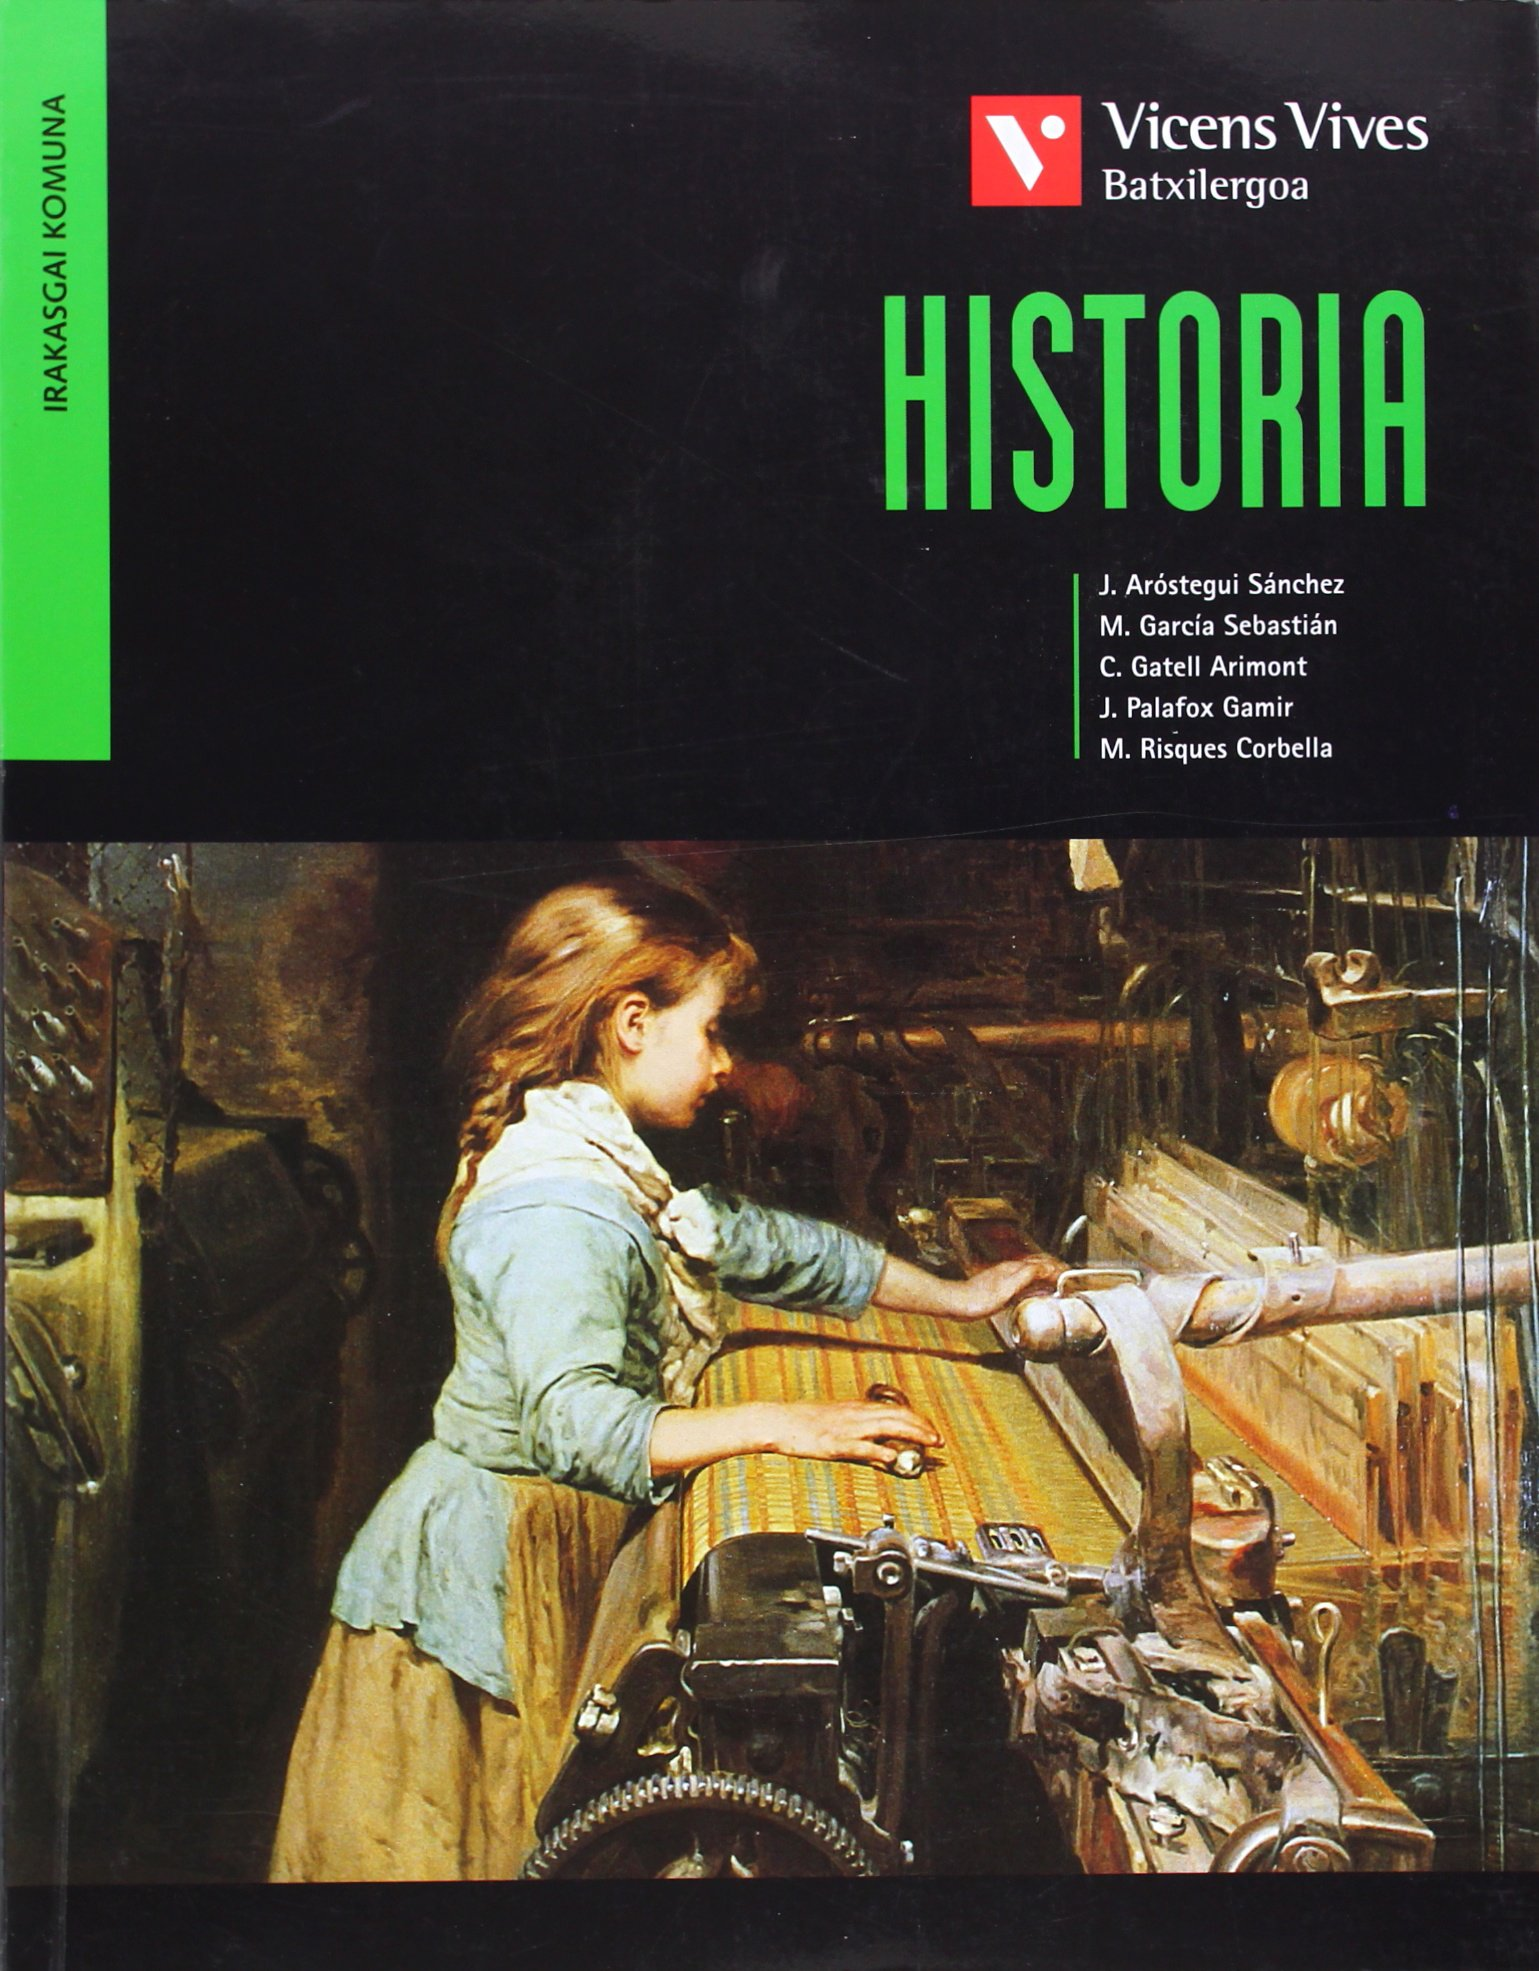 Historia (historia De España En Euskera): Amazon.es: Gatell Arimont, Cristina, Palafox Gamir, Jordi: Libros